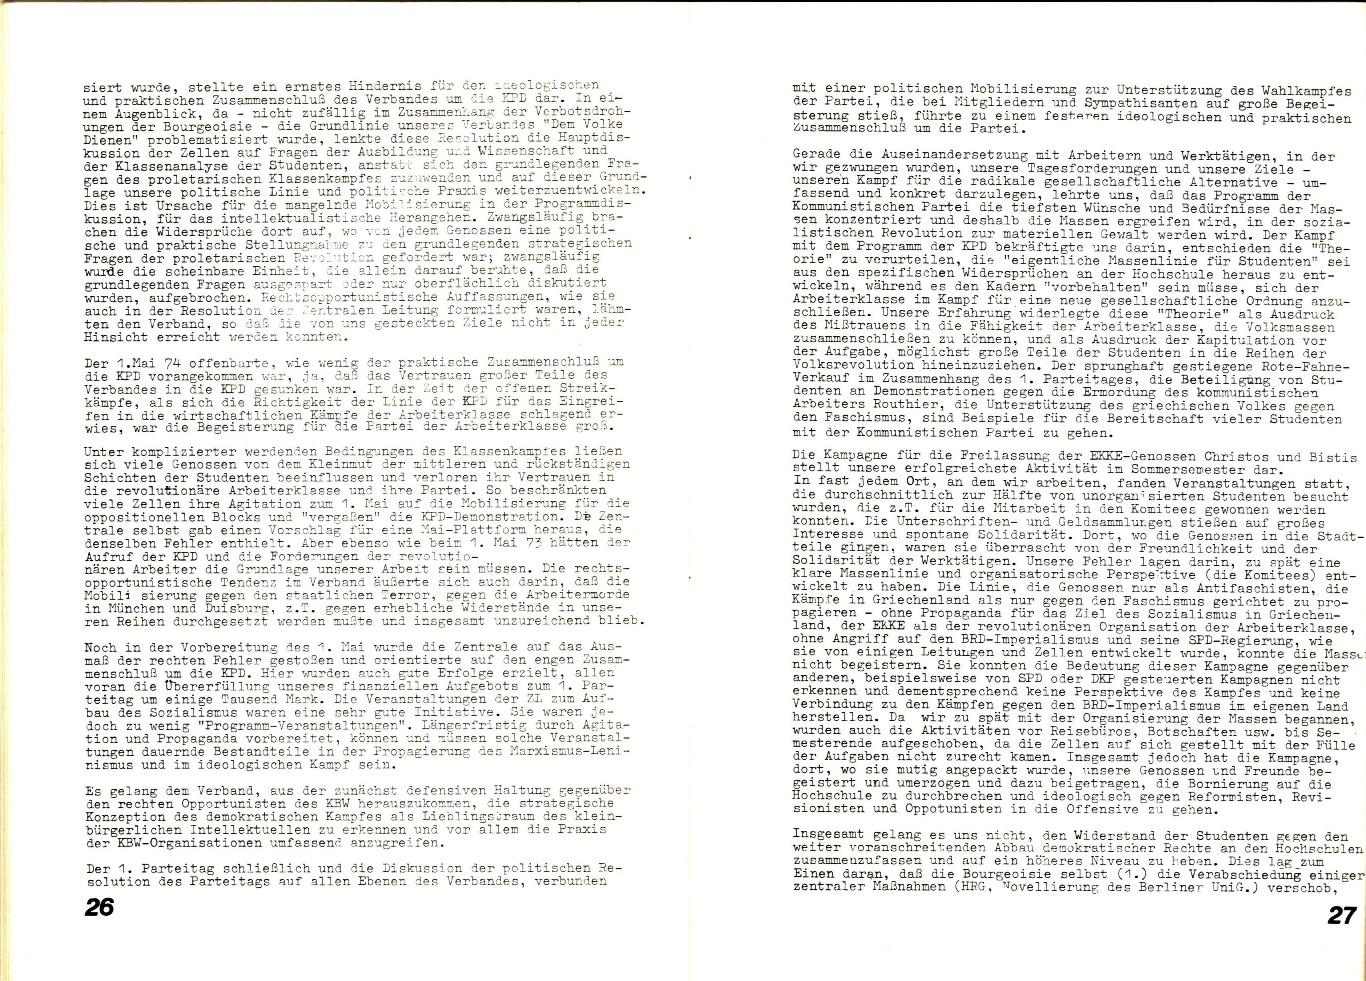 KSV_1974_Rechenschaftsbericht_15